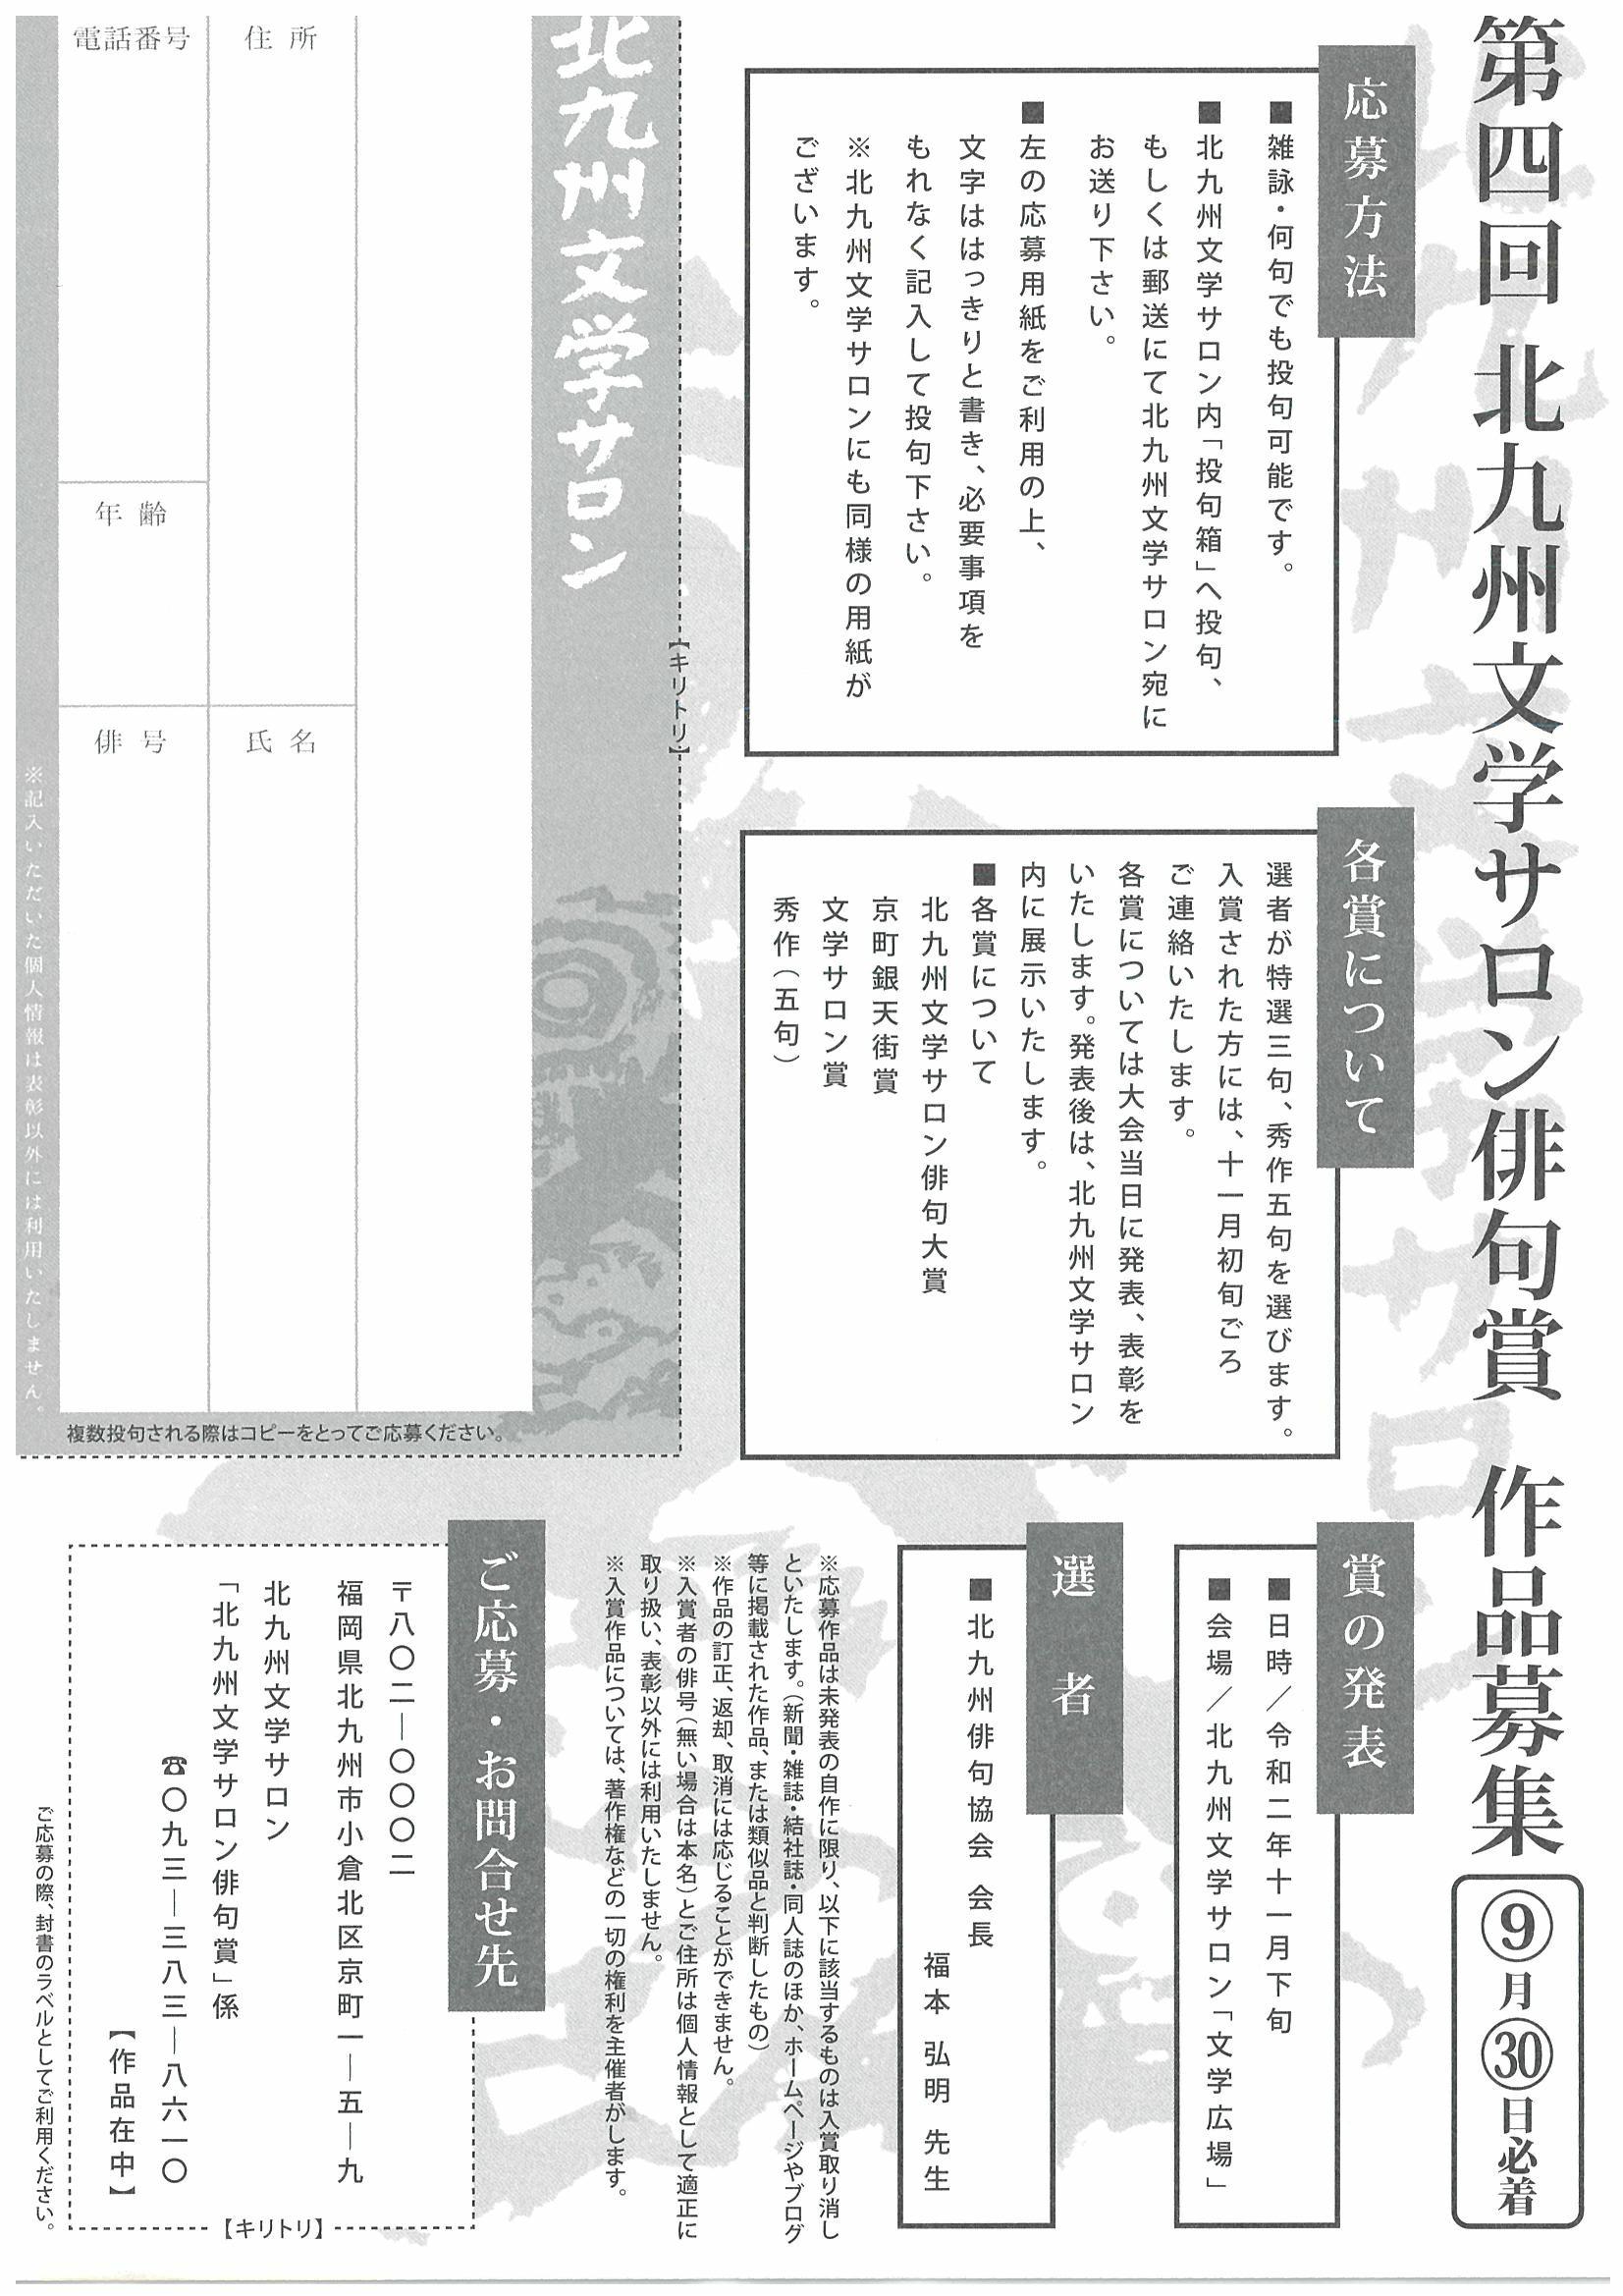 第4回北九州文学サロン俳句賞-2